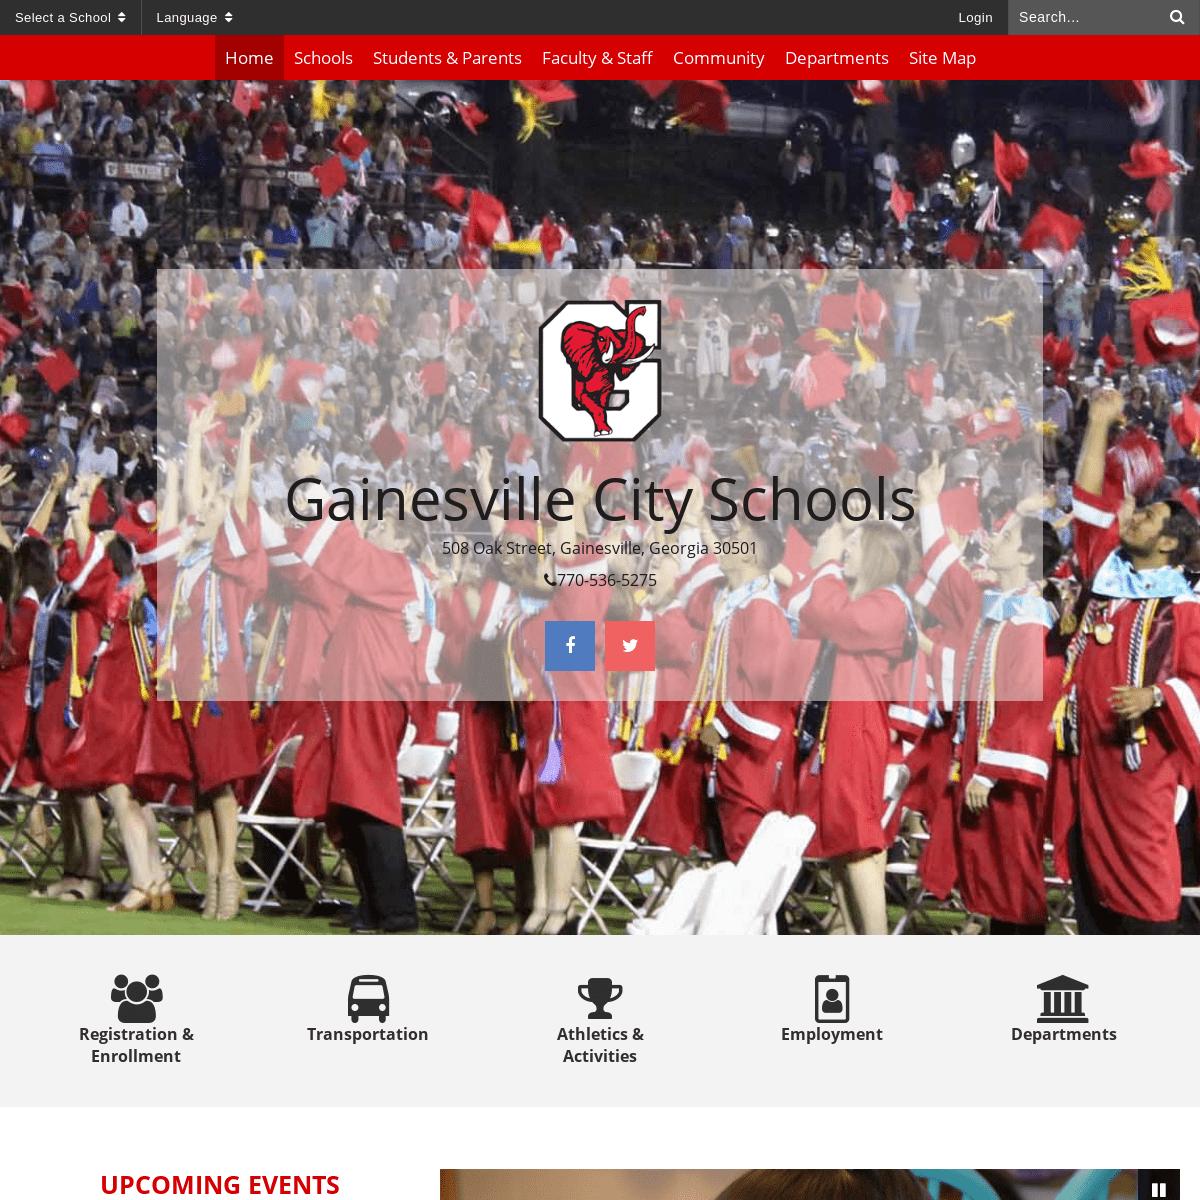 Home - Gainesville City Schools